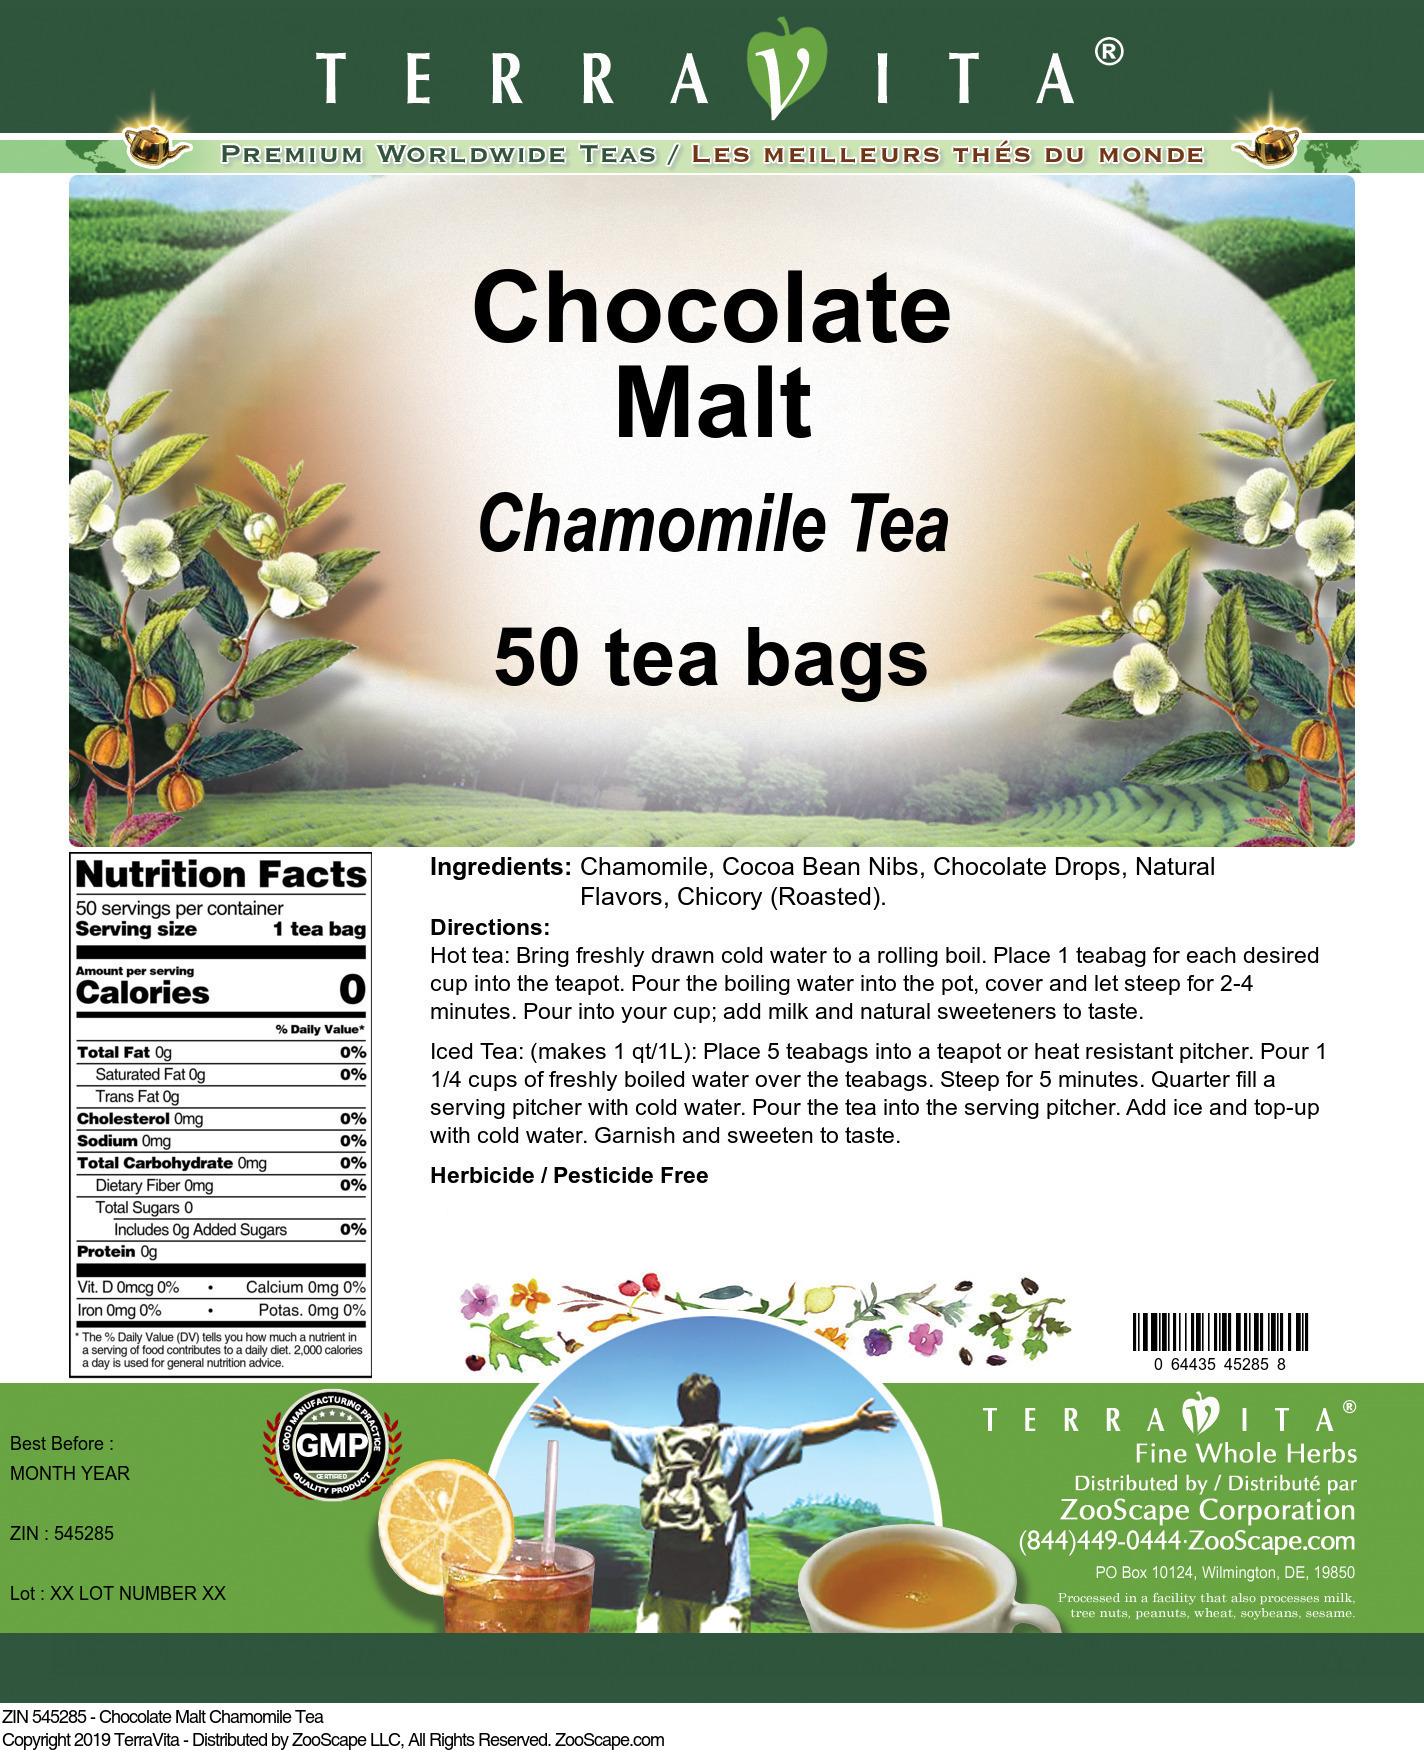 Chocolate Malt Chamomile Tea